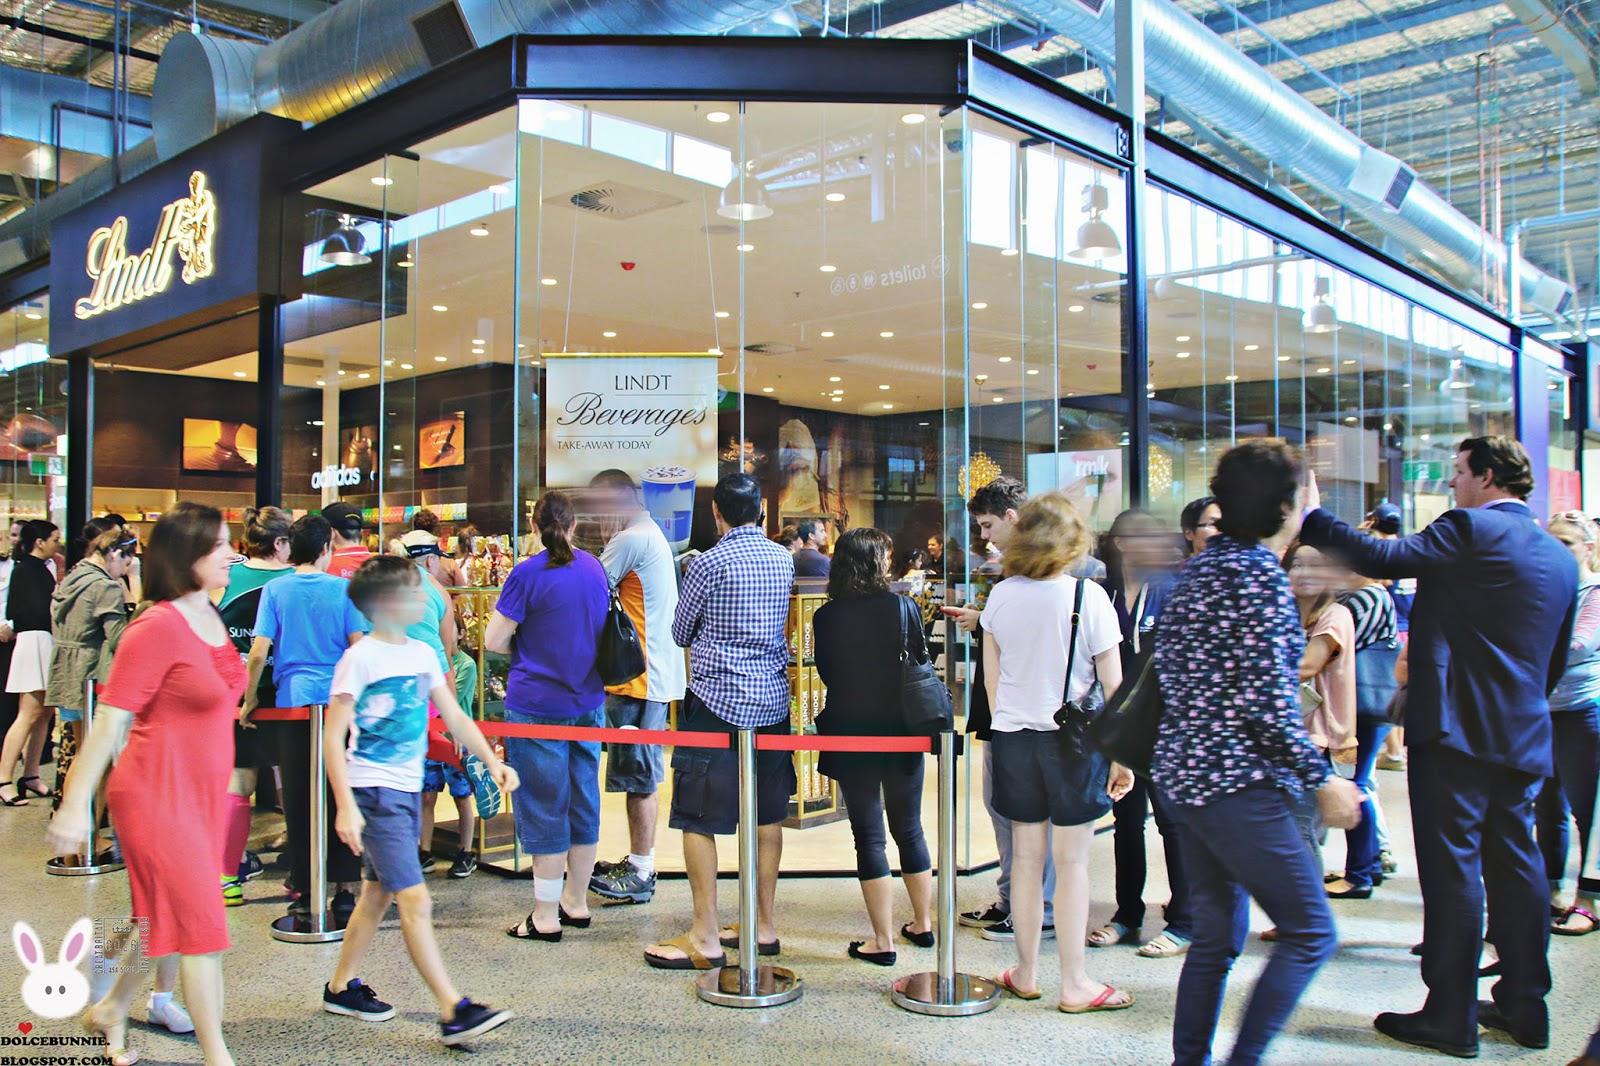 Lindt Chocolate Shop Opens At Dfo Brisbane Brisbane Airport Qld